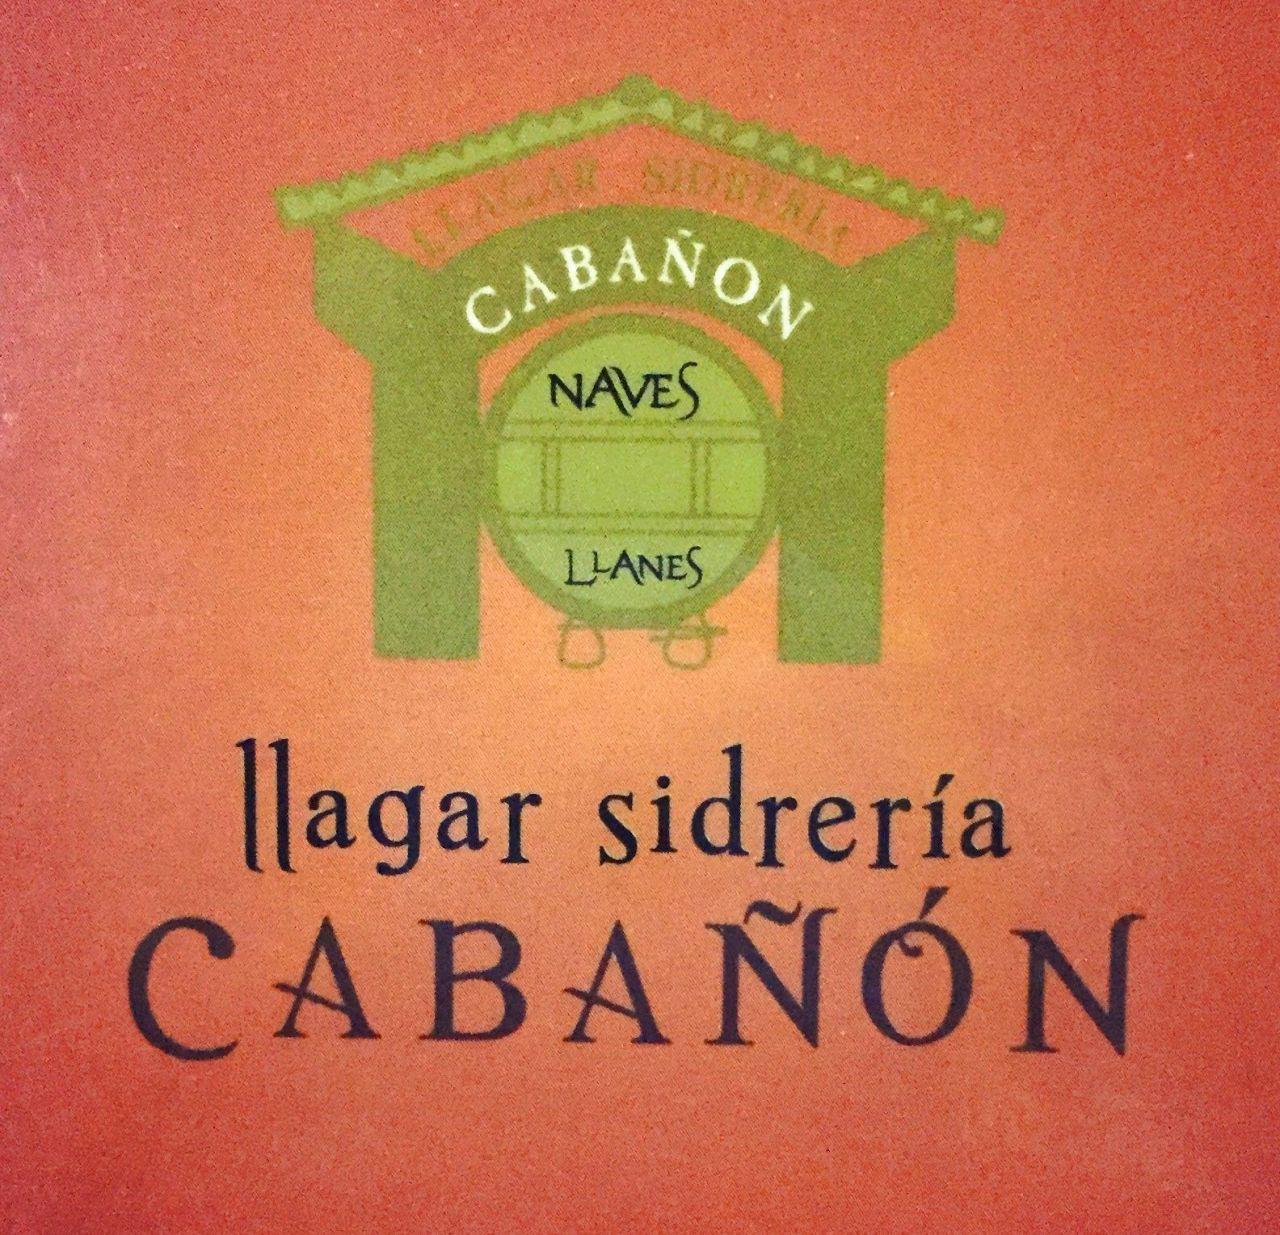 Cabañón